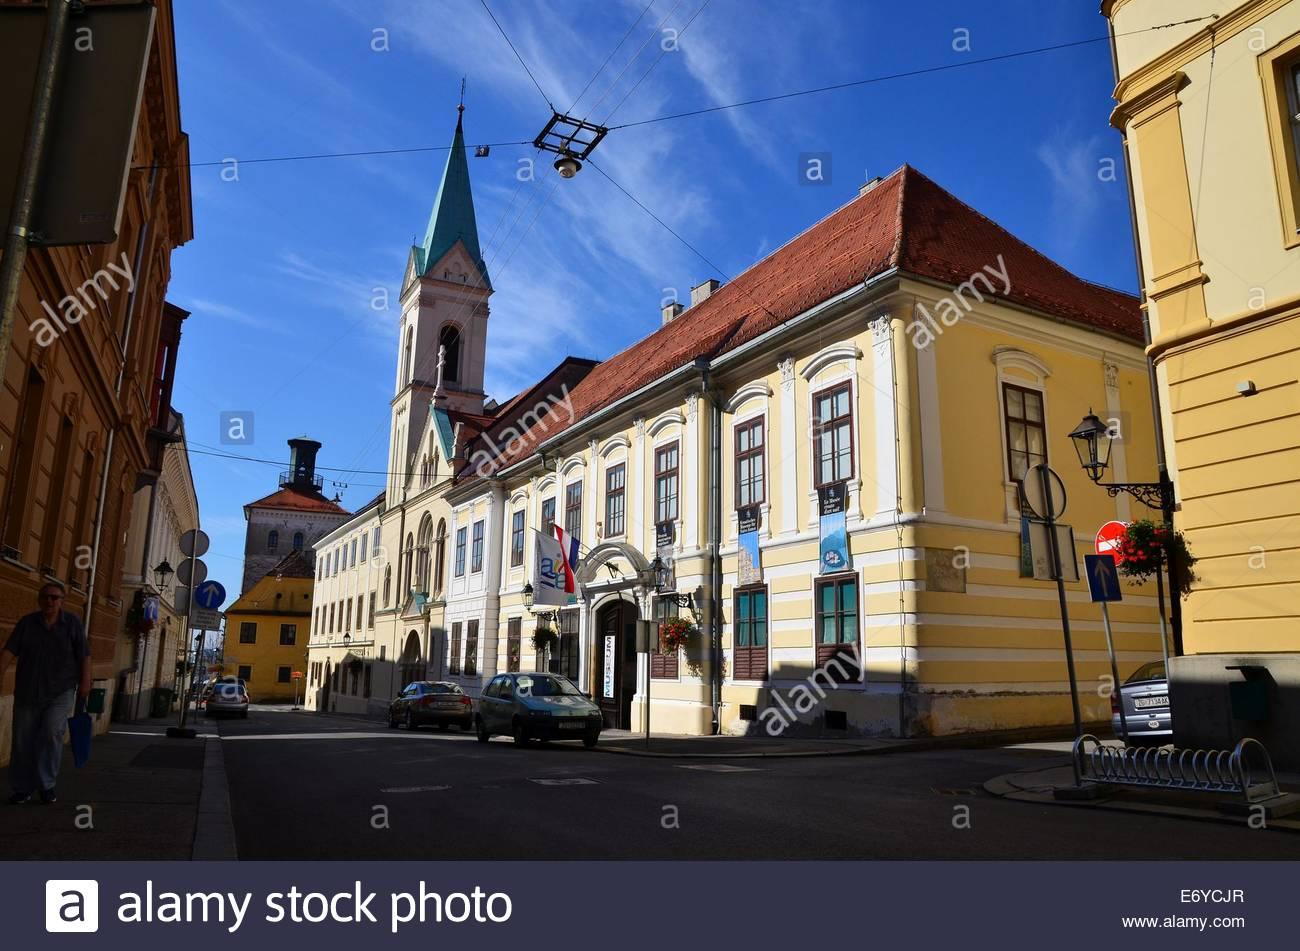 Croatian Museum of Naive Art, upper town, Zagreb, Croatia - Stock Image